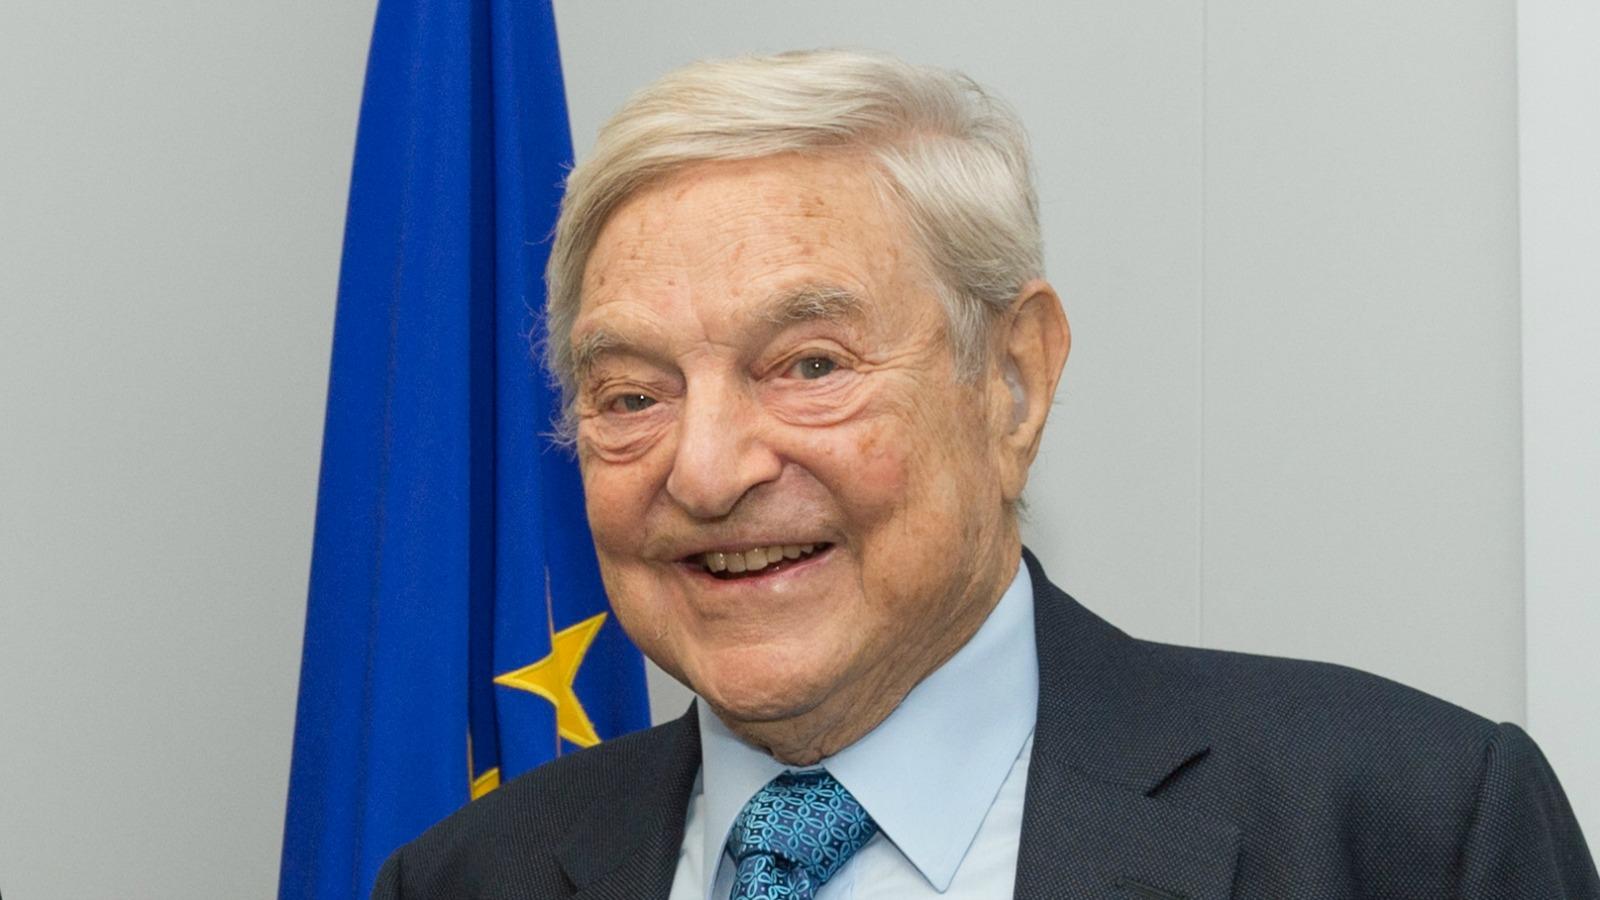 https://www.euractiv.com/wp-content/uploads/sites/2/2016/06/George-Soros.jpg